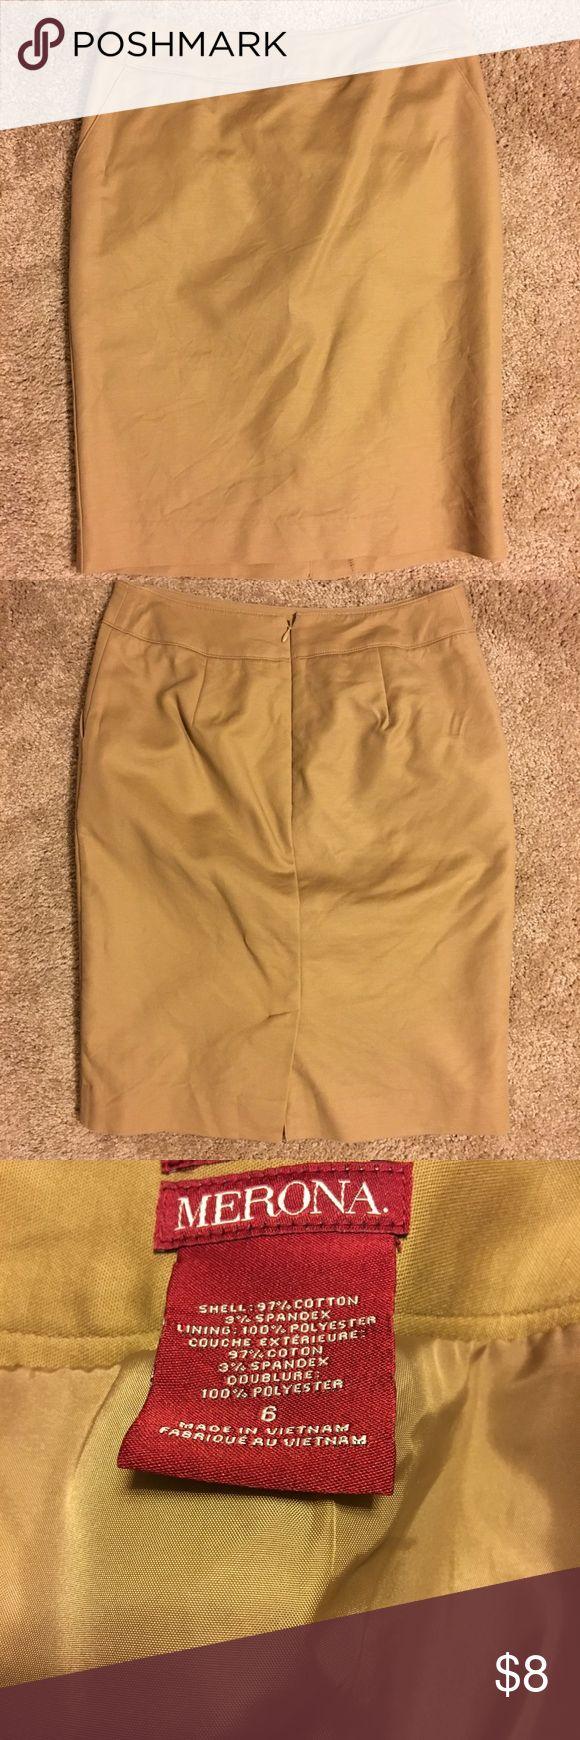 Khaki Pencil Skirt Khaki Skirt from Target size 6. Great condition. Worn twice. Non smoking home. Merona Skirts Pencil